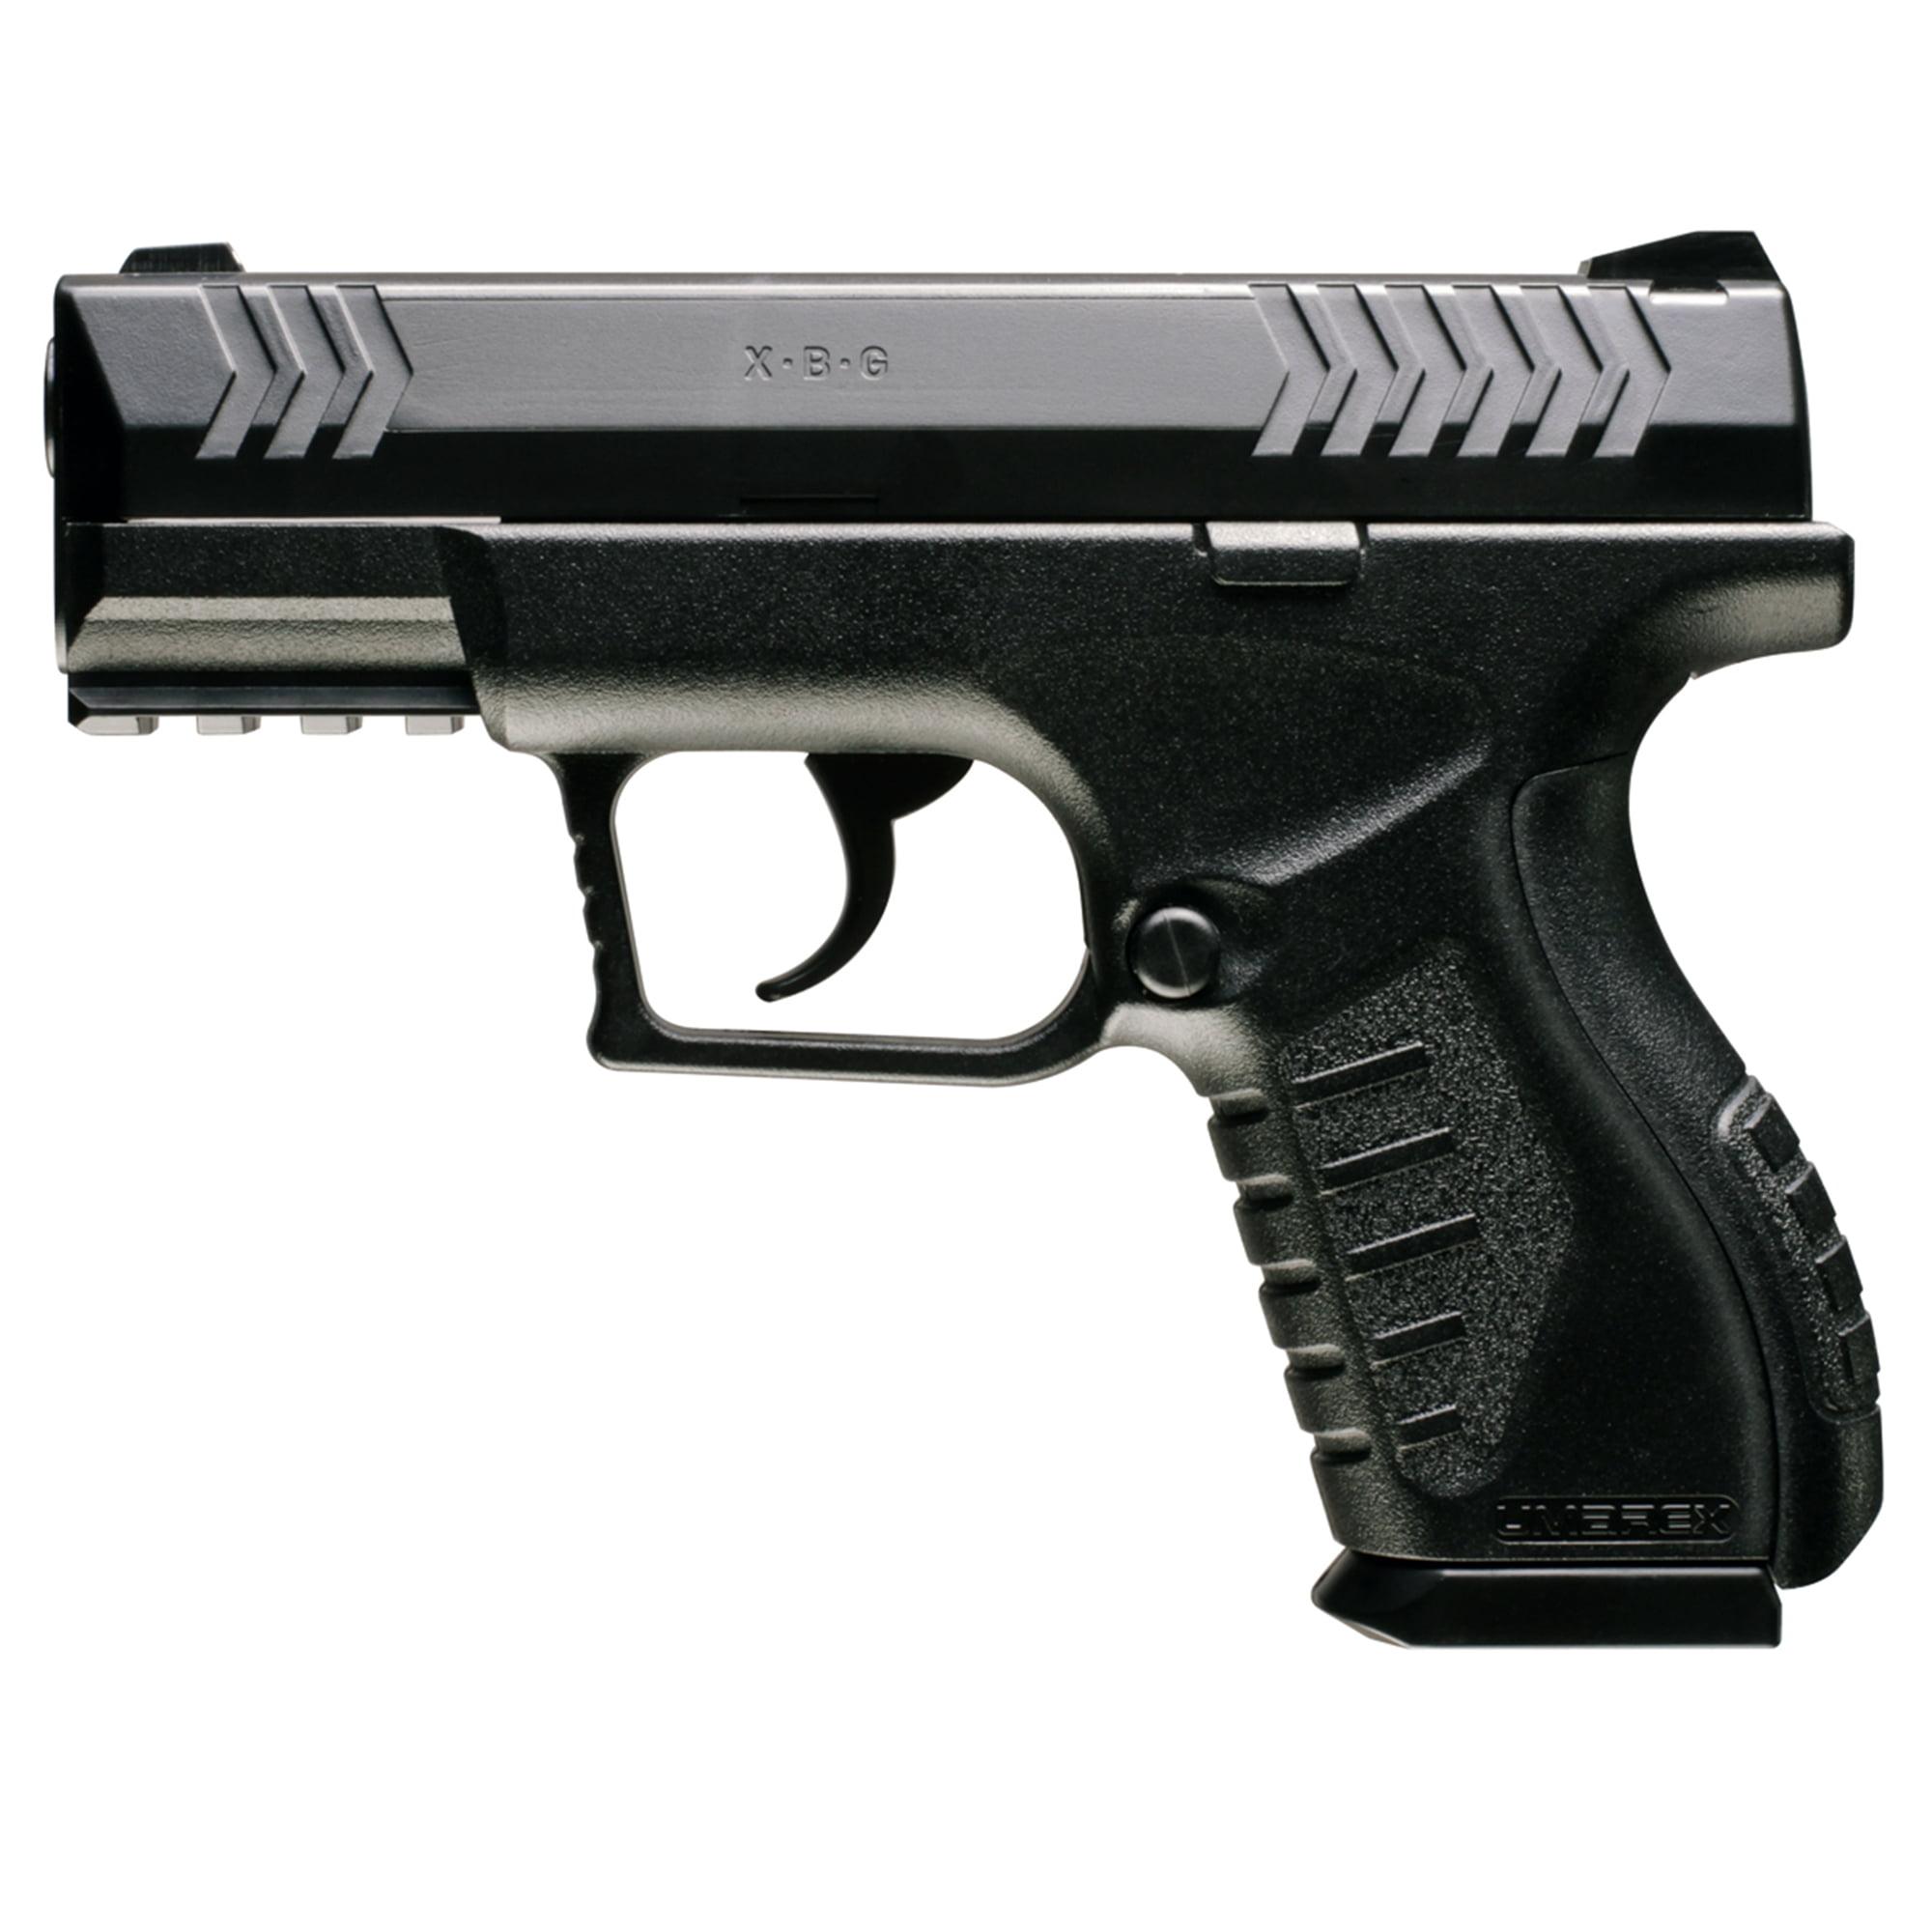 Umarex XBG 2254804 BB Air Pistol 410fps 0.177cal w Double Ac by Umarex USA